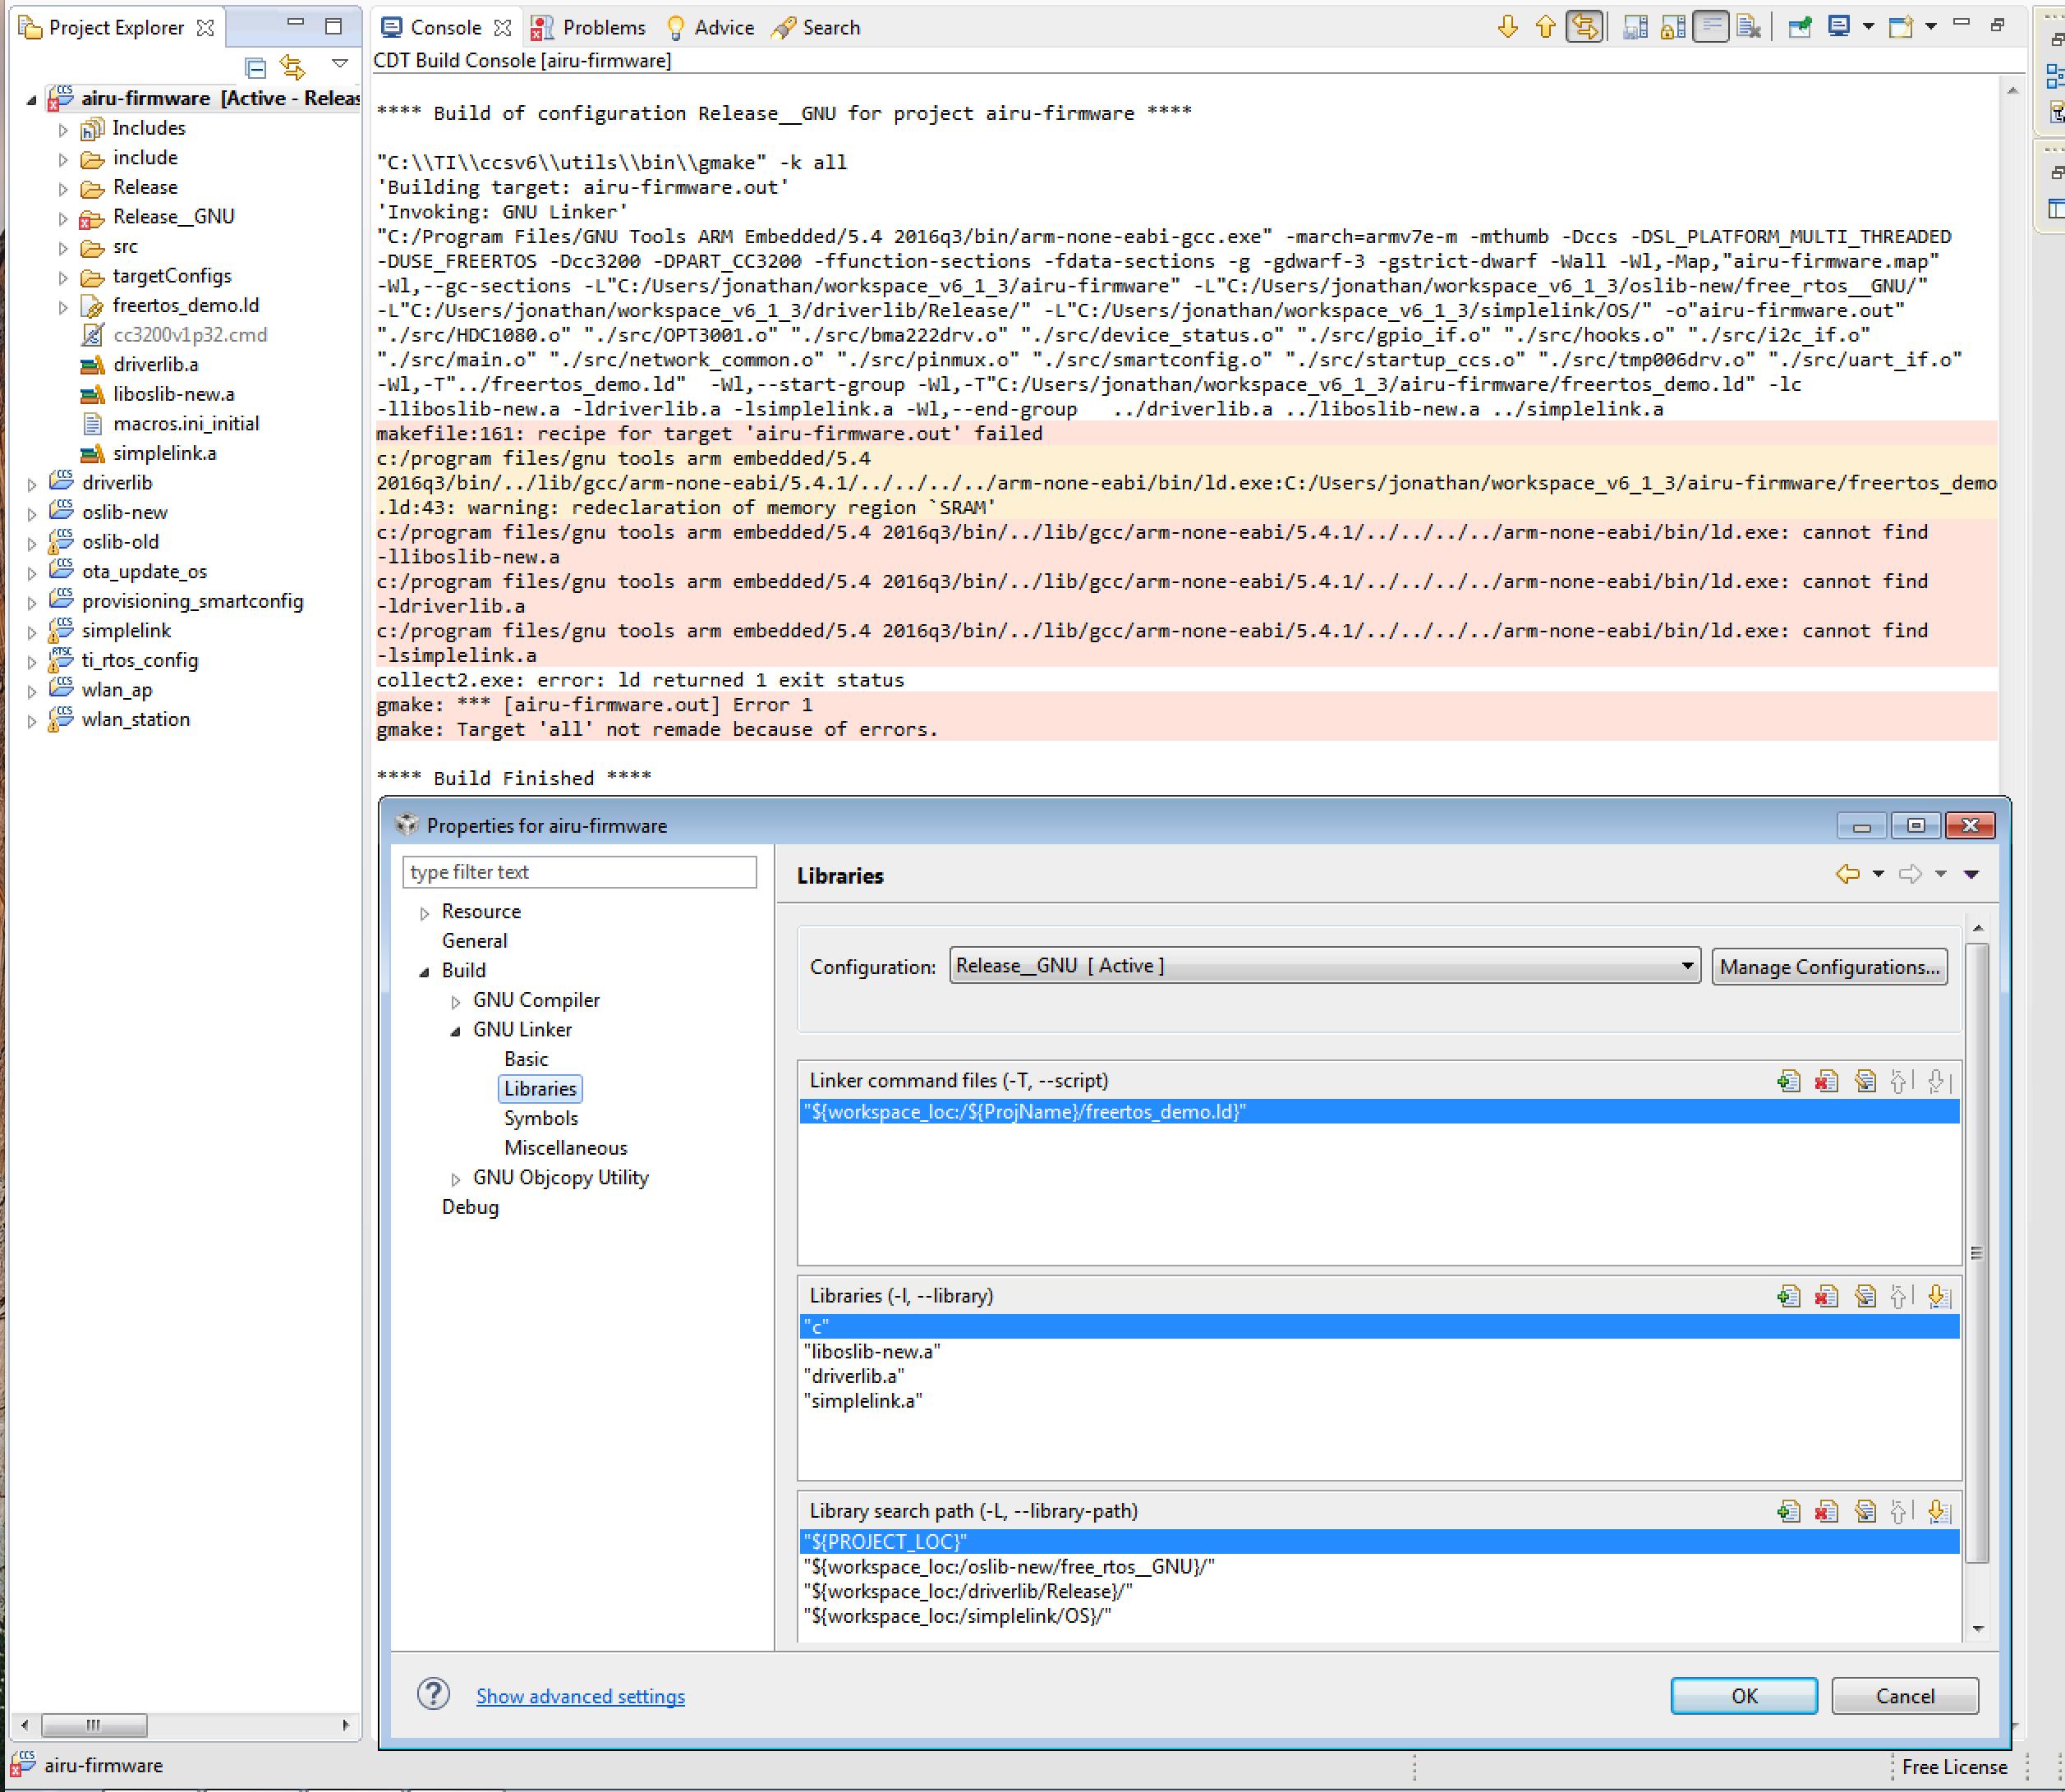 Resolved] GCC - Linking in oslib, driverlib, and simplelink